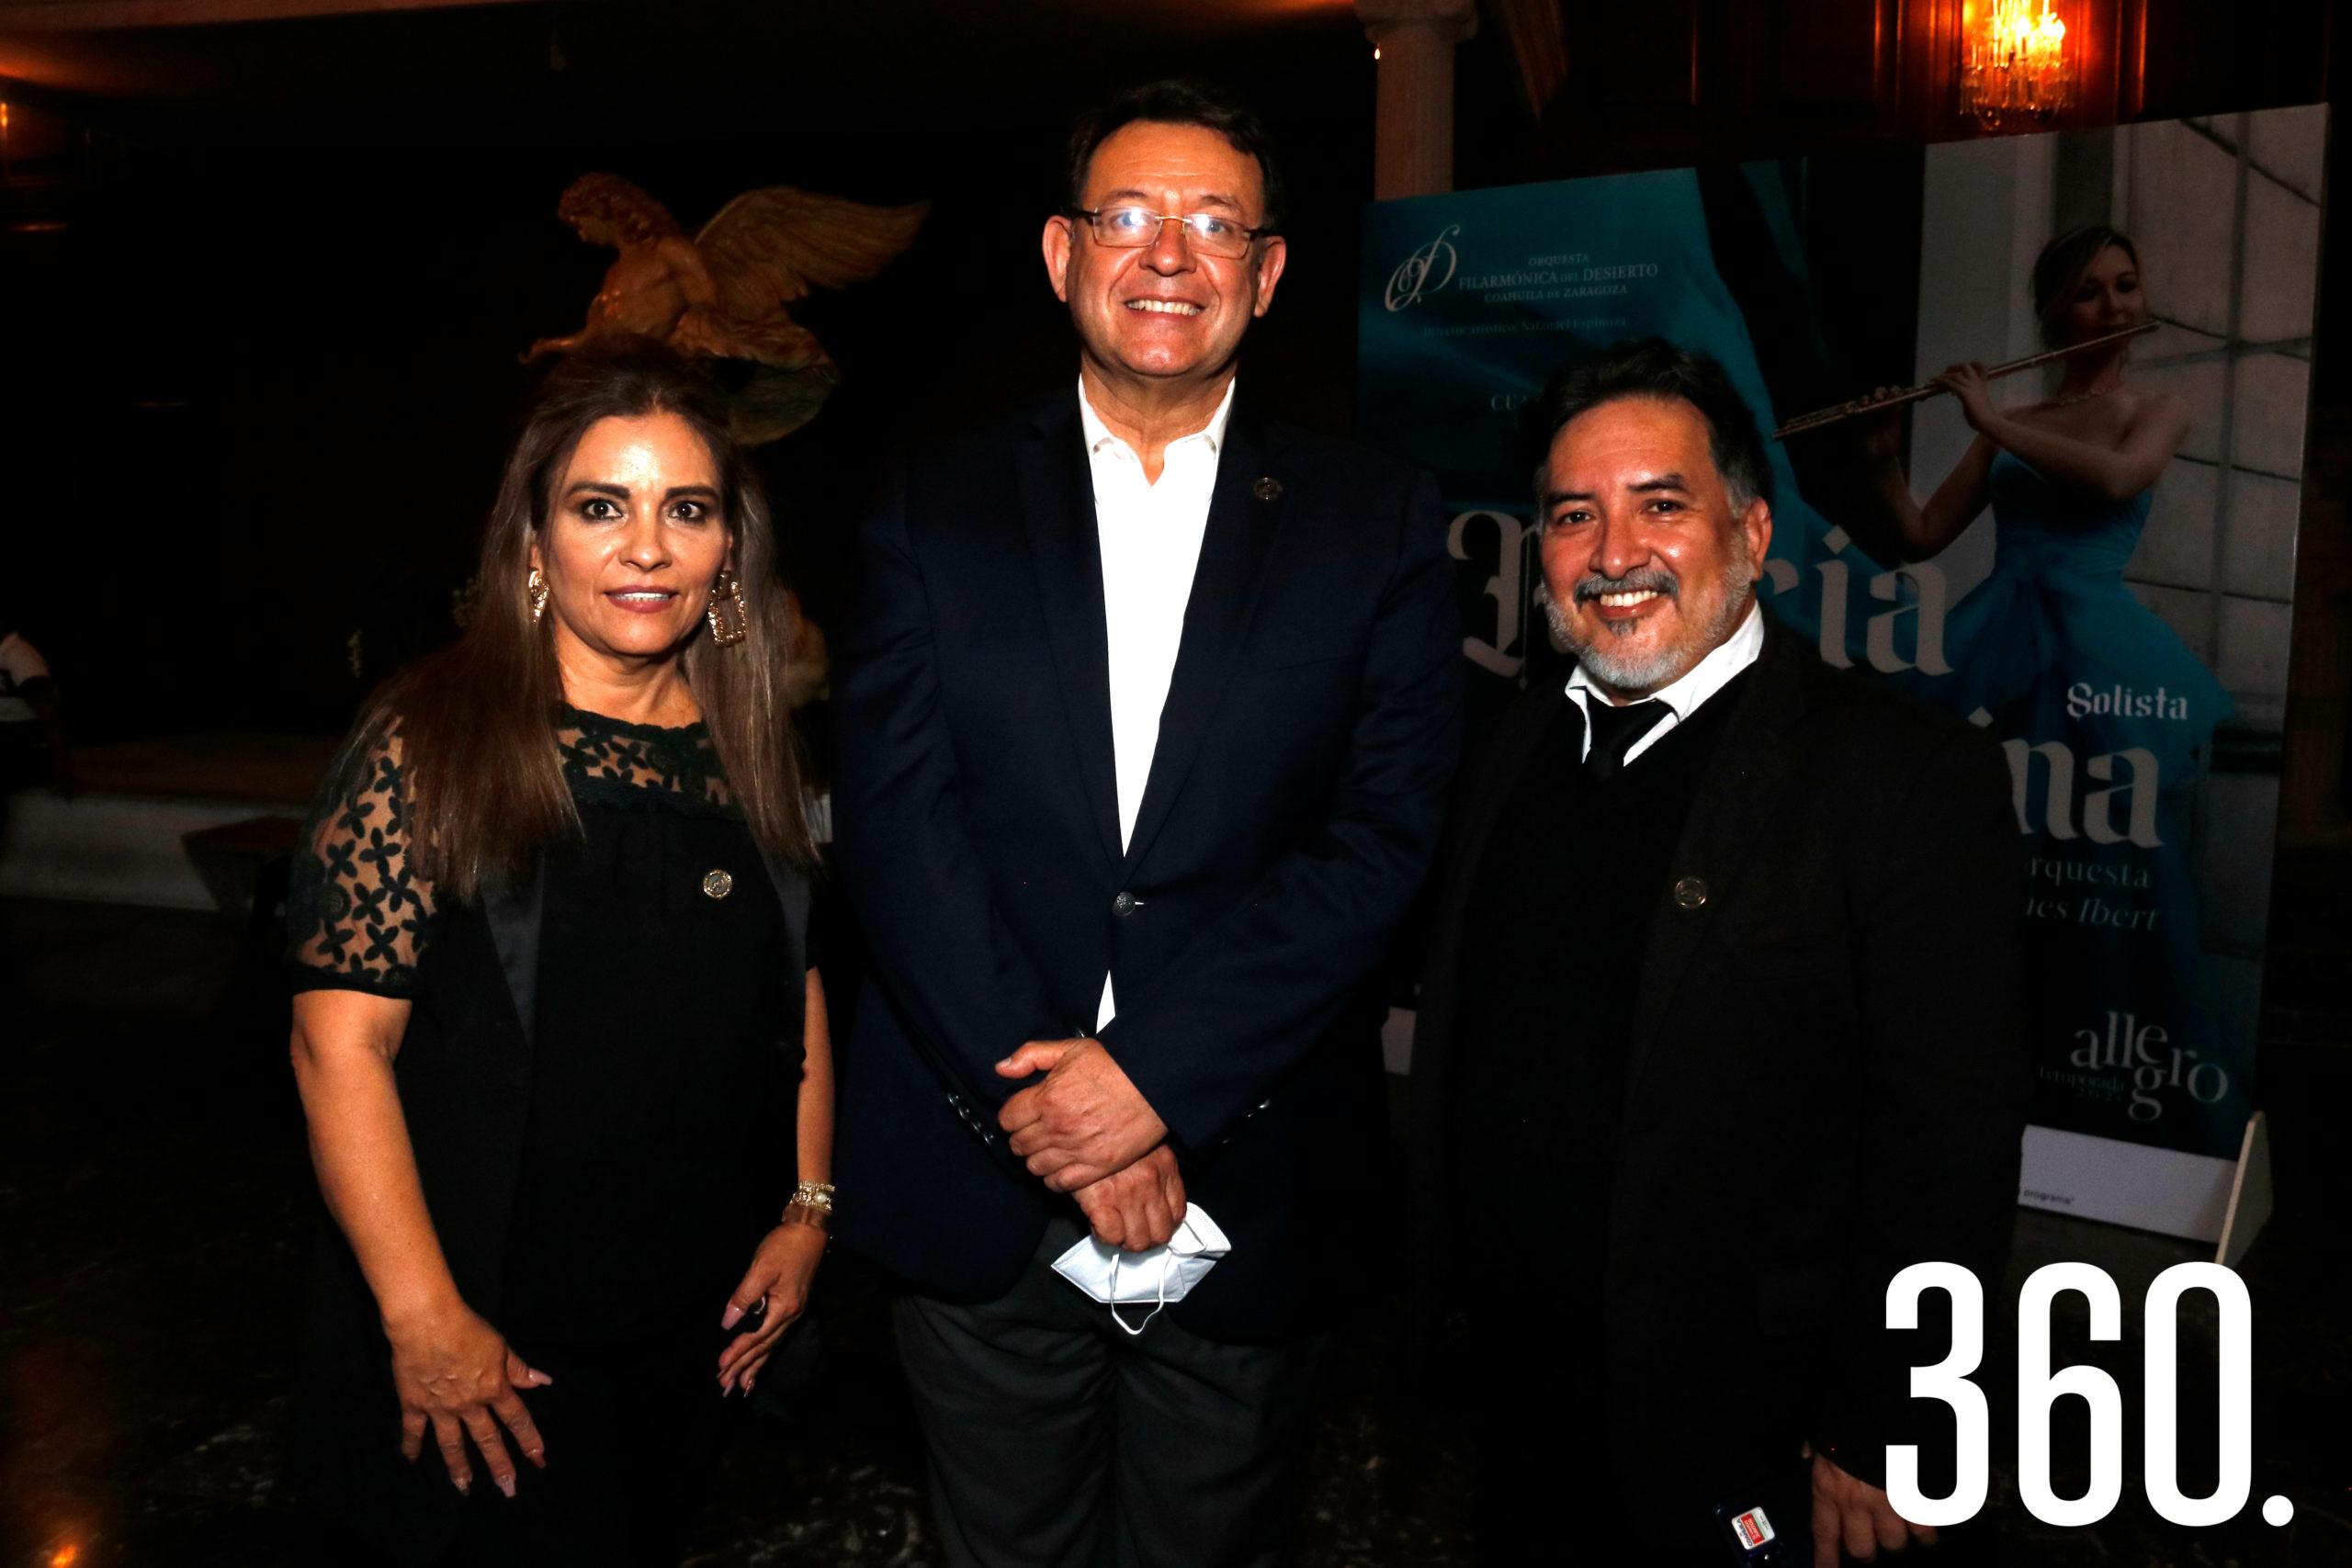 Lulú Aguilar, Lauro Cortez y Prometeo Murillo.